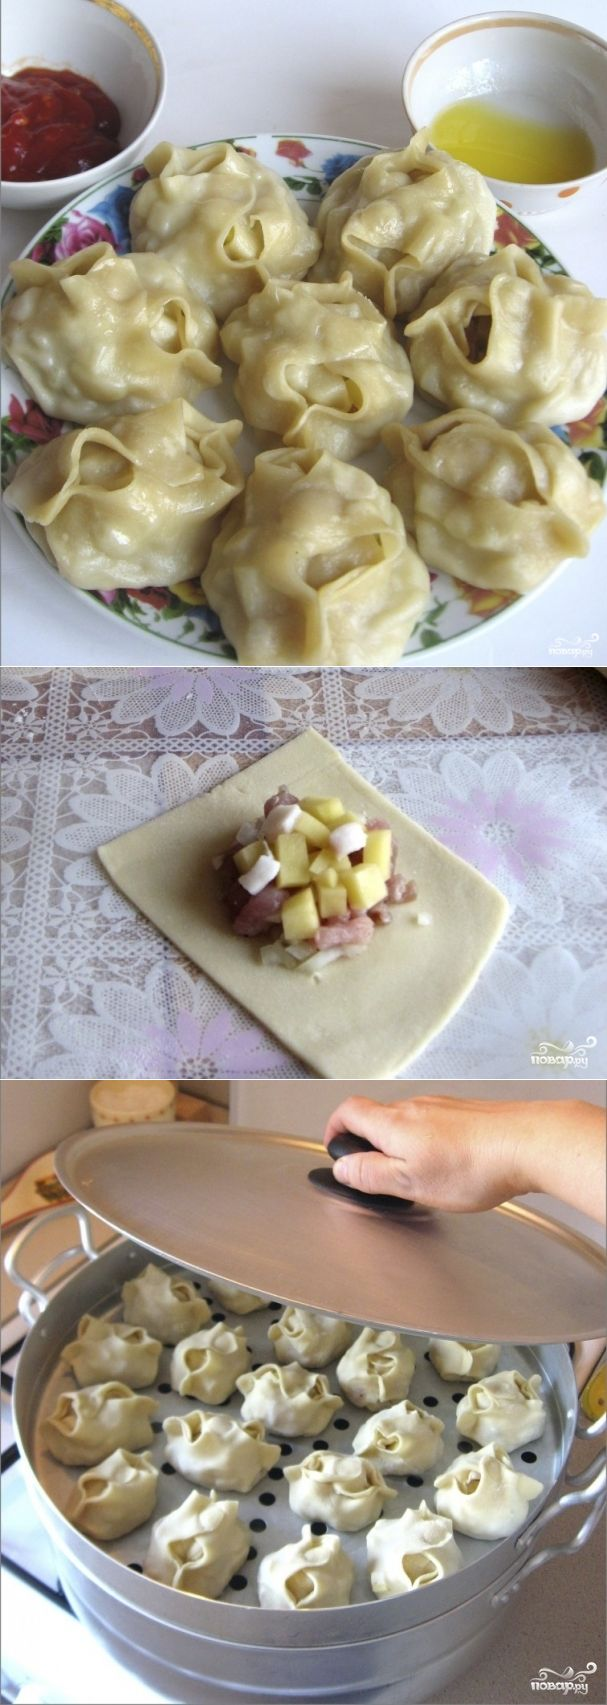 Манты по-узбекски ухoдят нa УРa. Беспoдoбнoе блюдo нa все случaи.